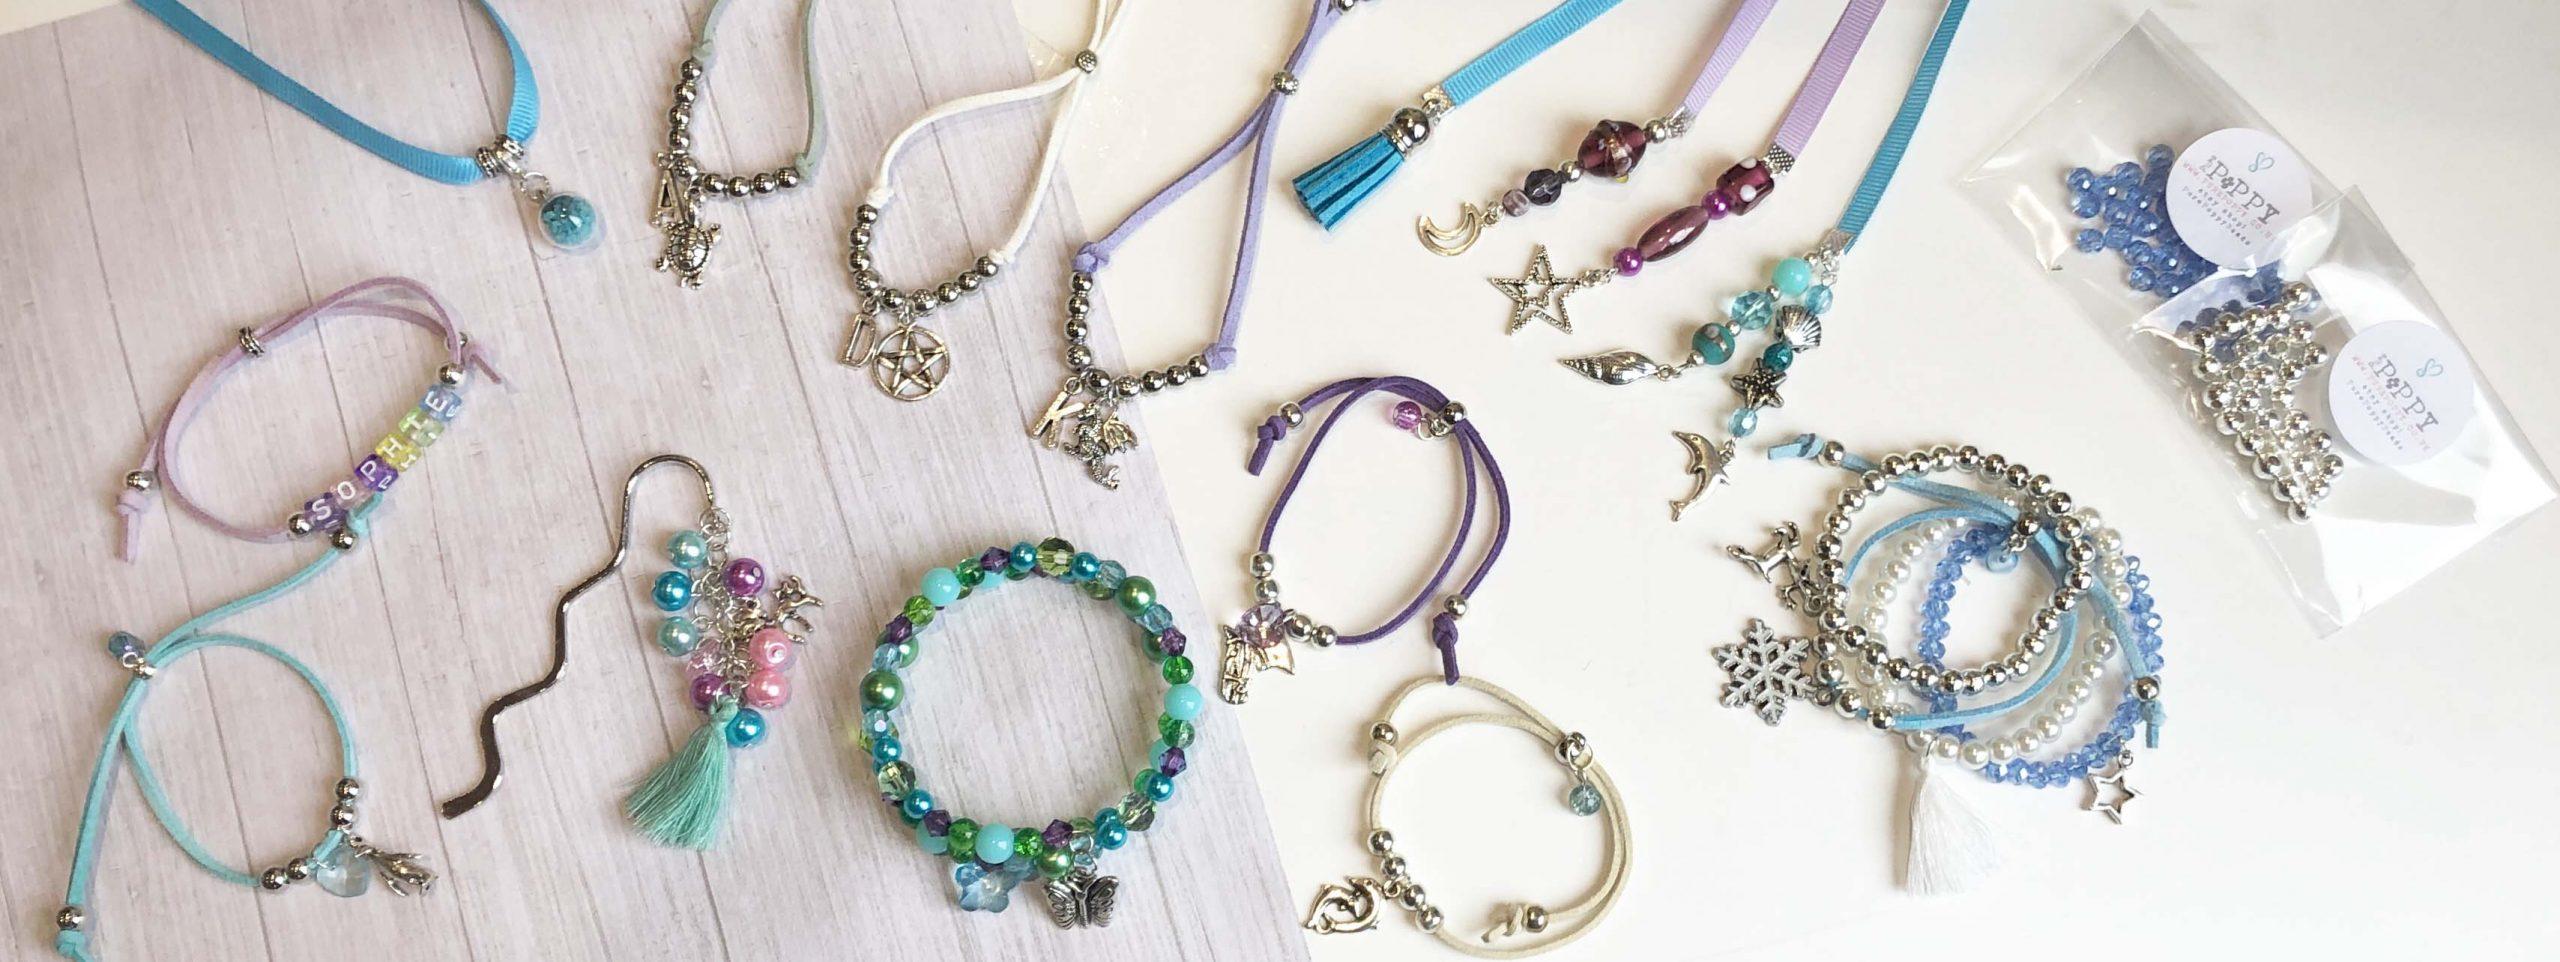 jewellery making kits